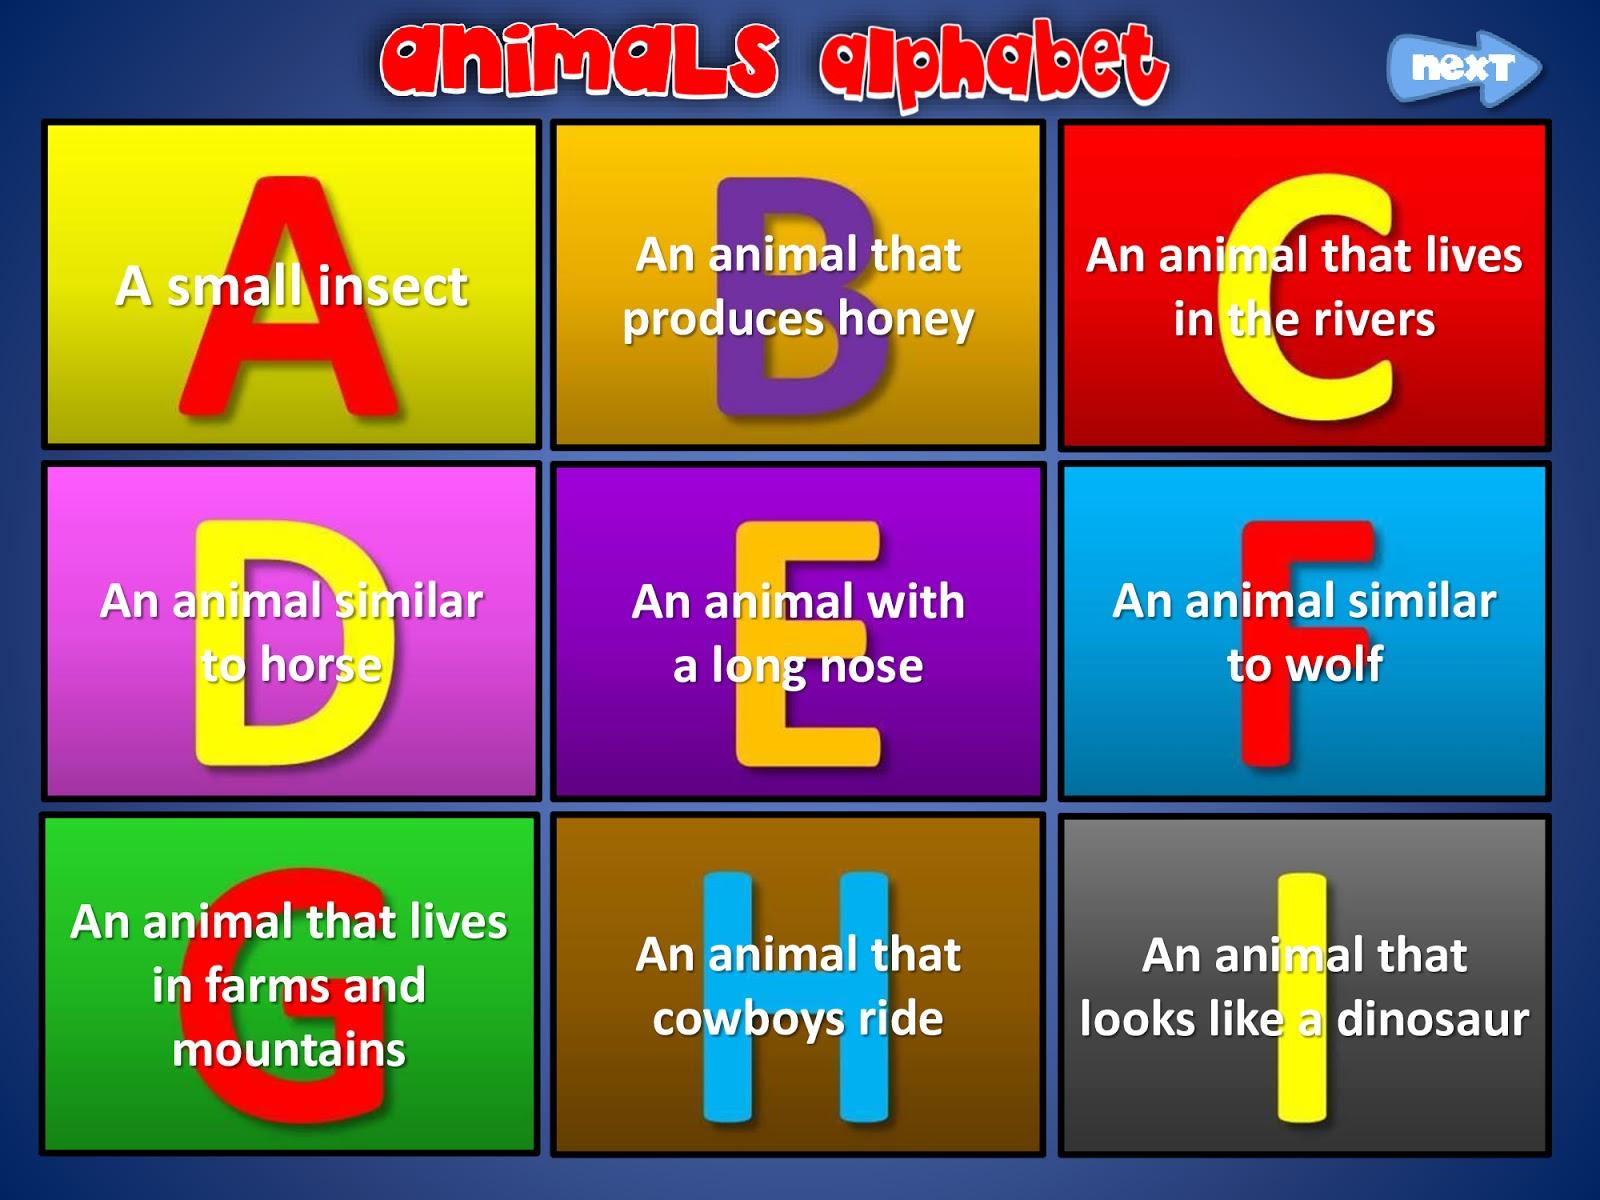 alphabet activities preschool printables free powerpoint slides download, alphabet worksheets kindergarten, alphabet worksheets printable, alphabet letters design beautiful